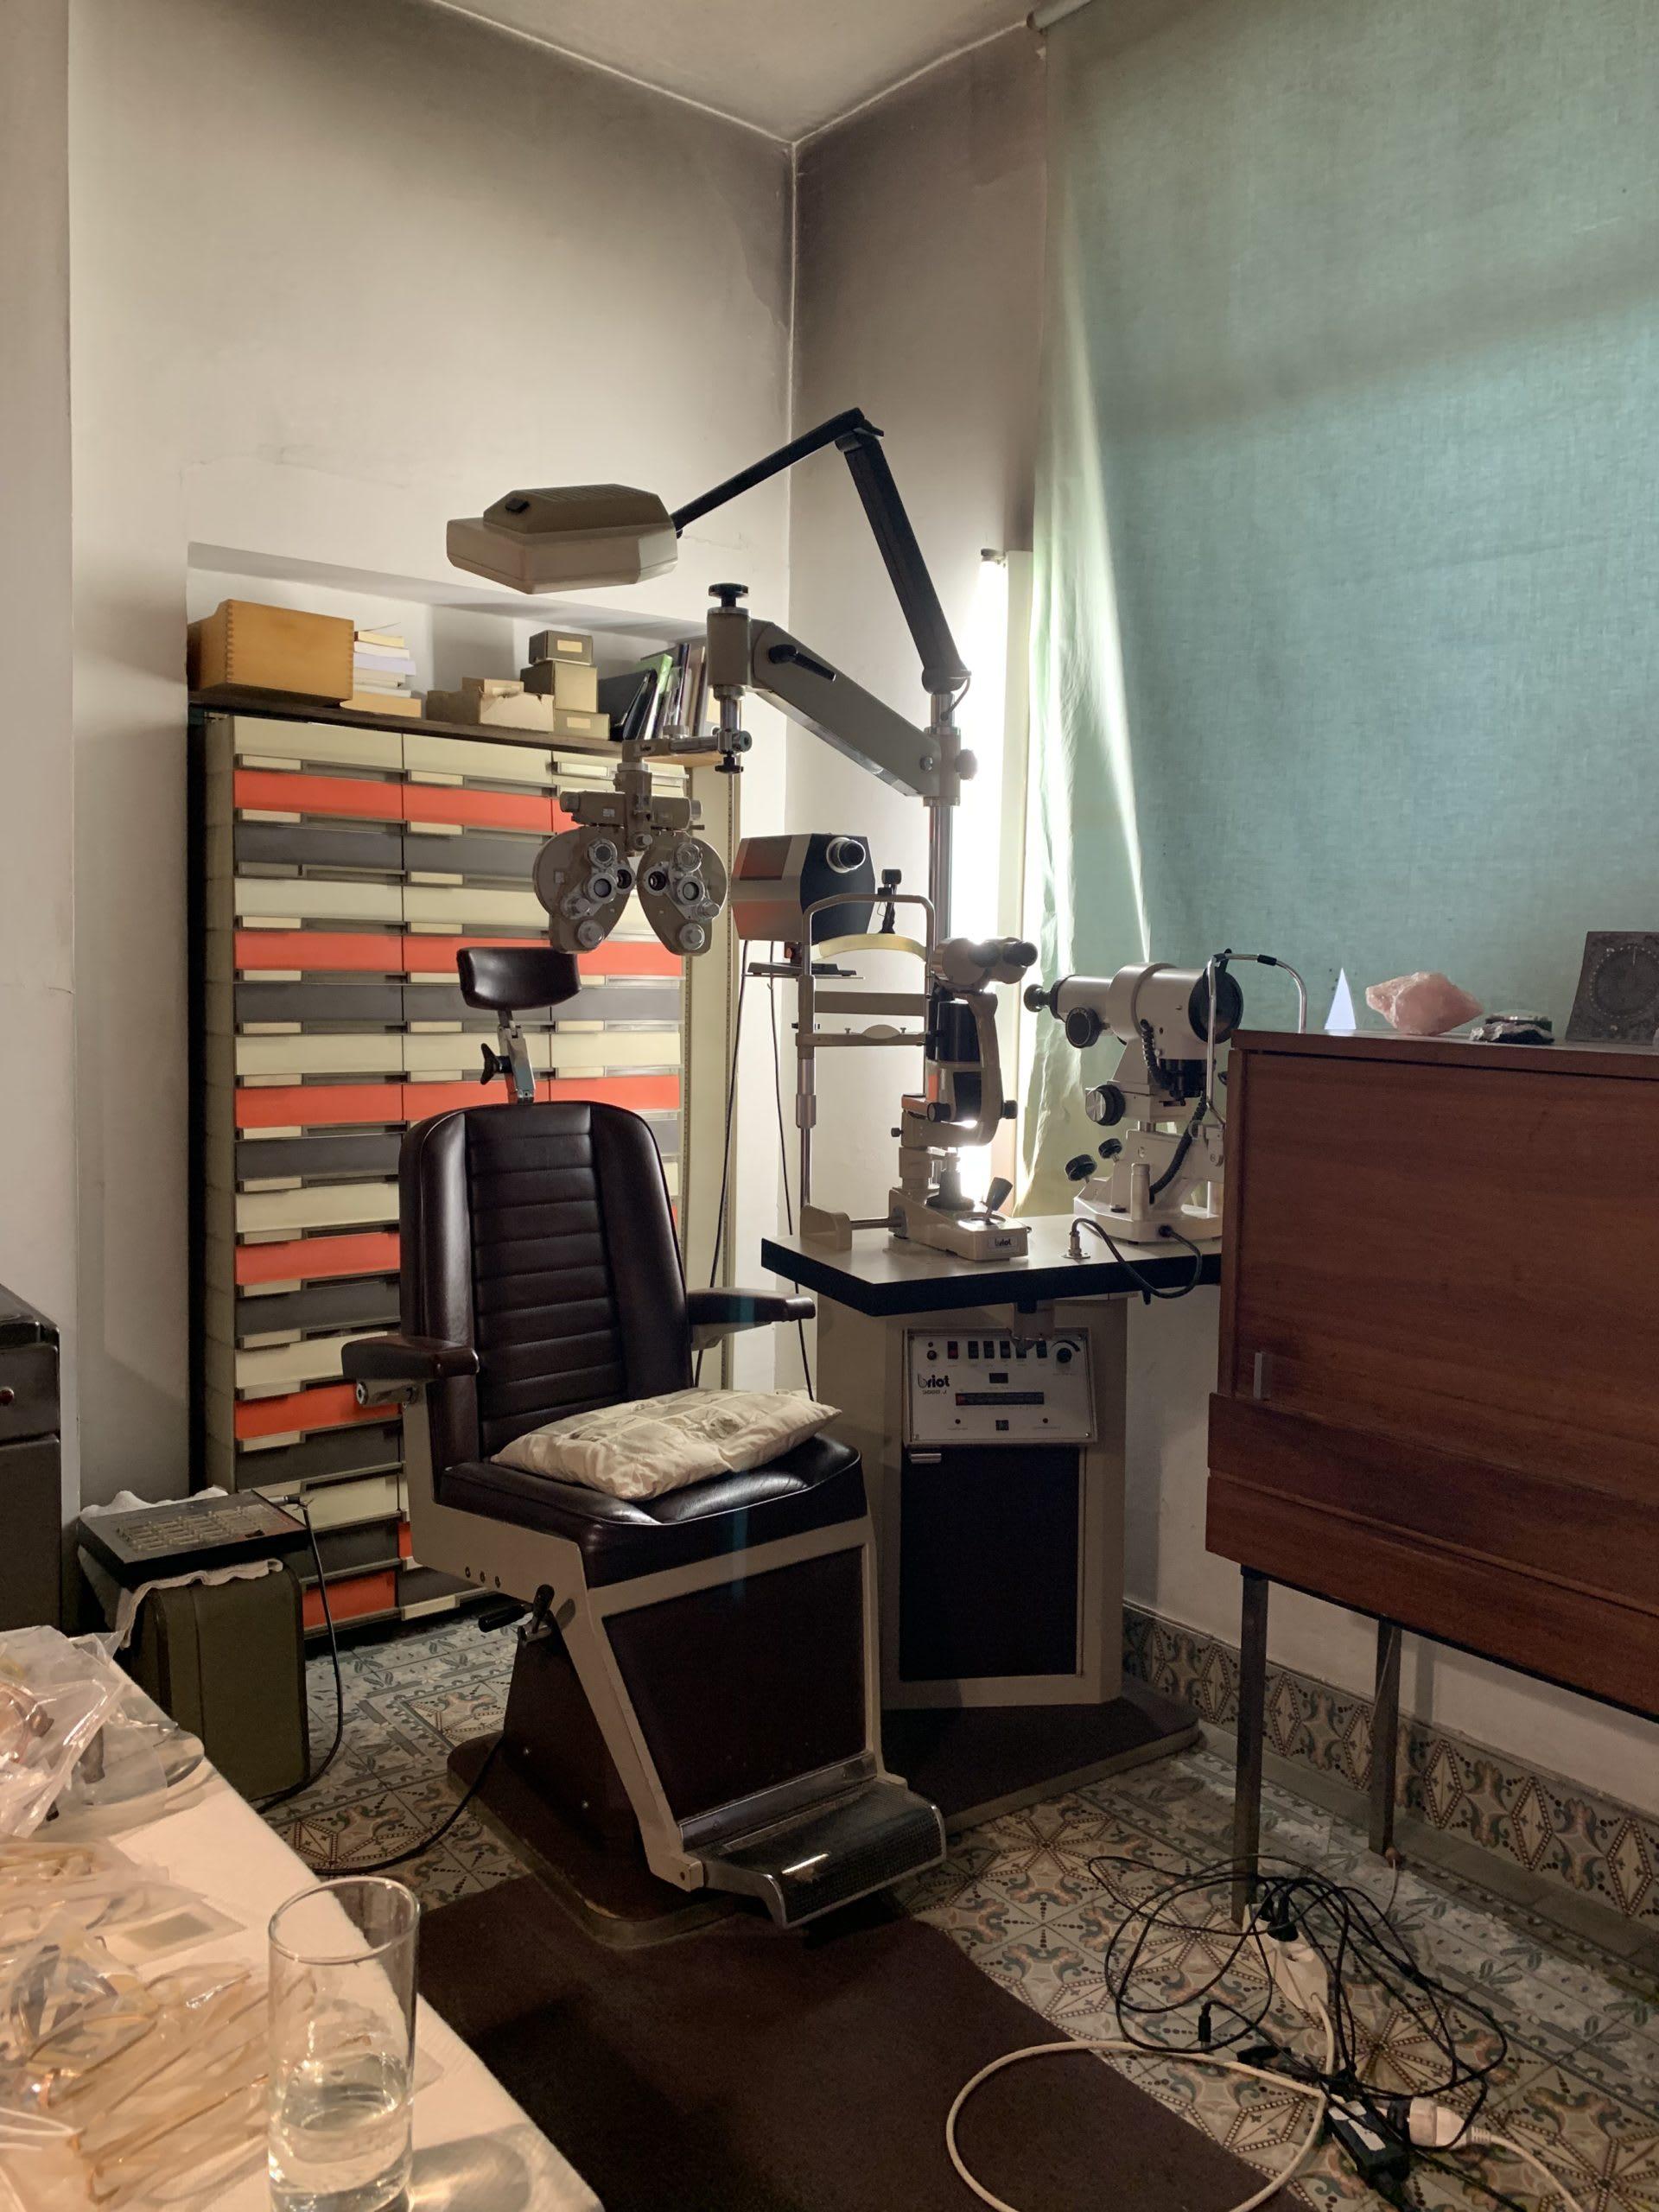 bidules-latest-digging-hainaut-scan-atmosphere